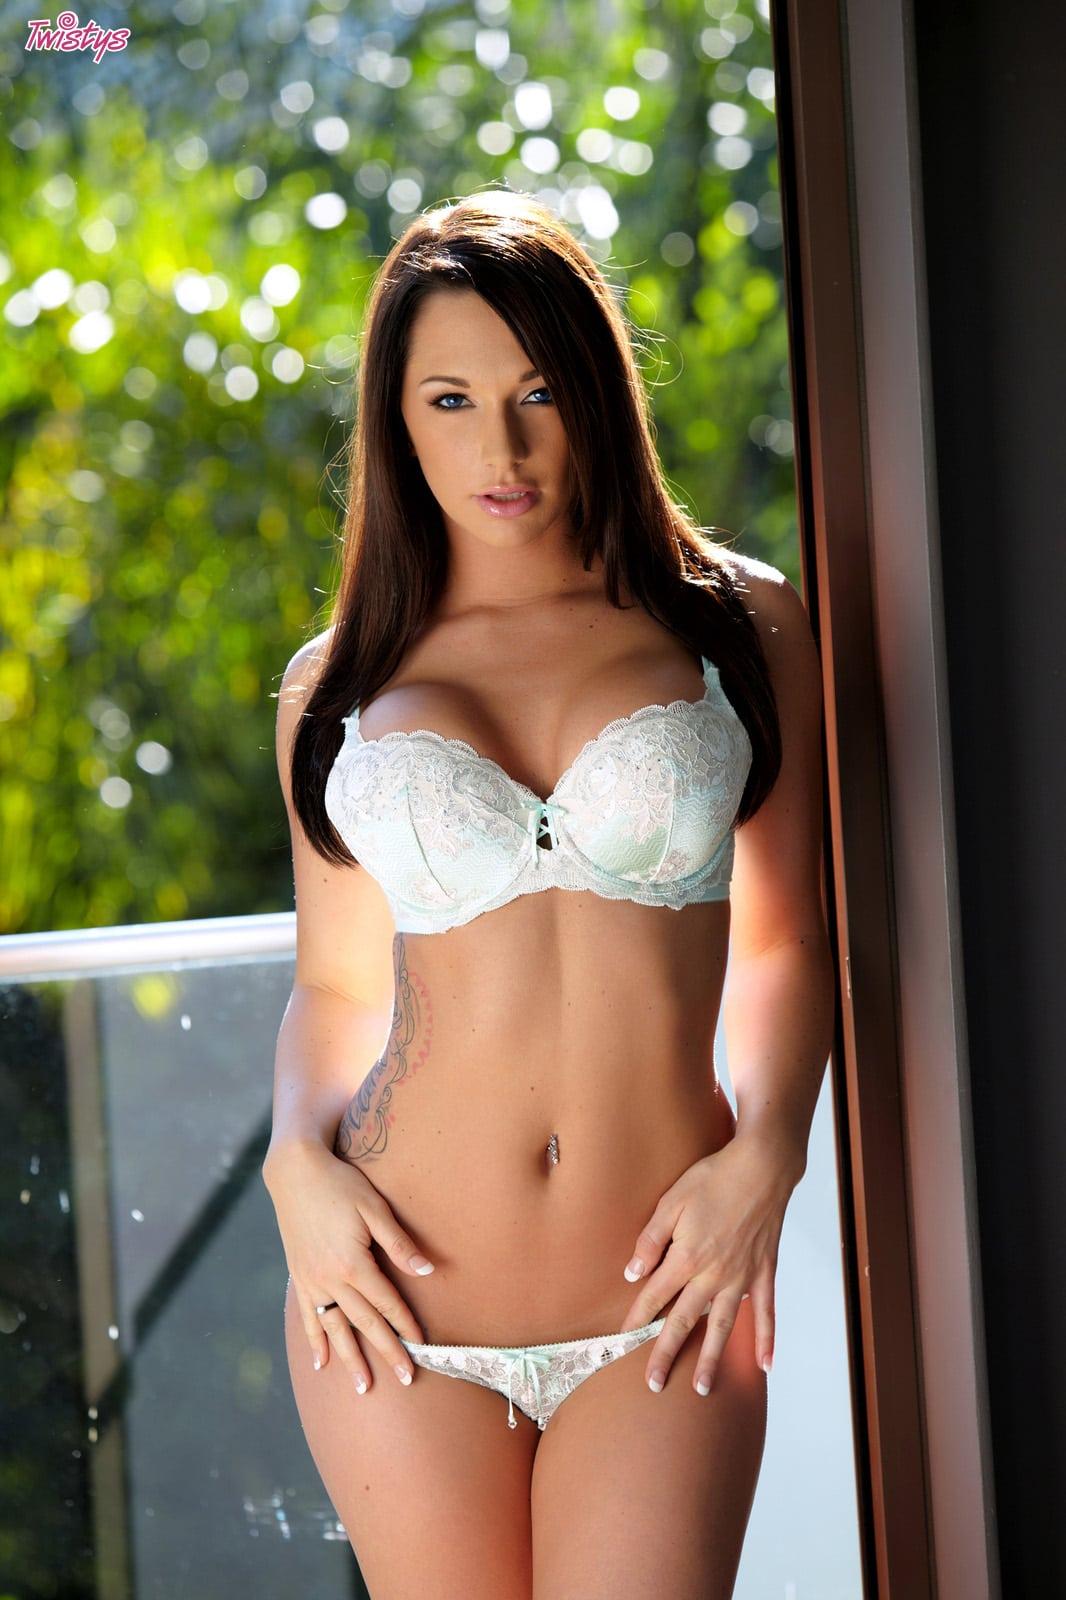 Madison ivy black latex top bikini strip 9